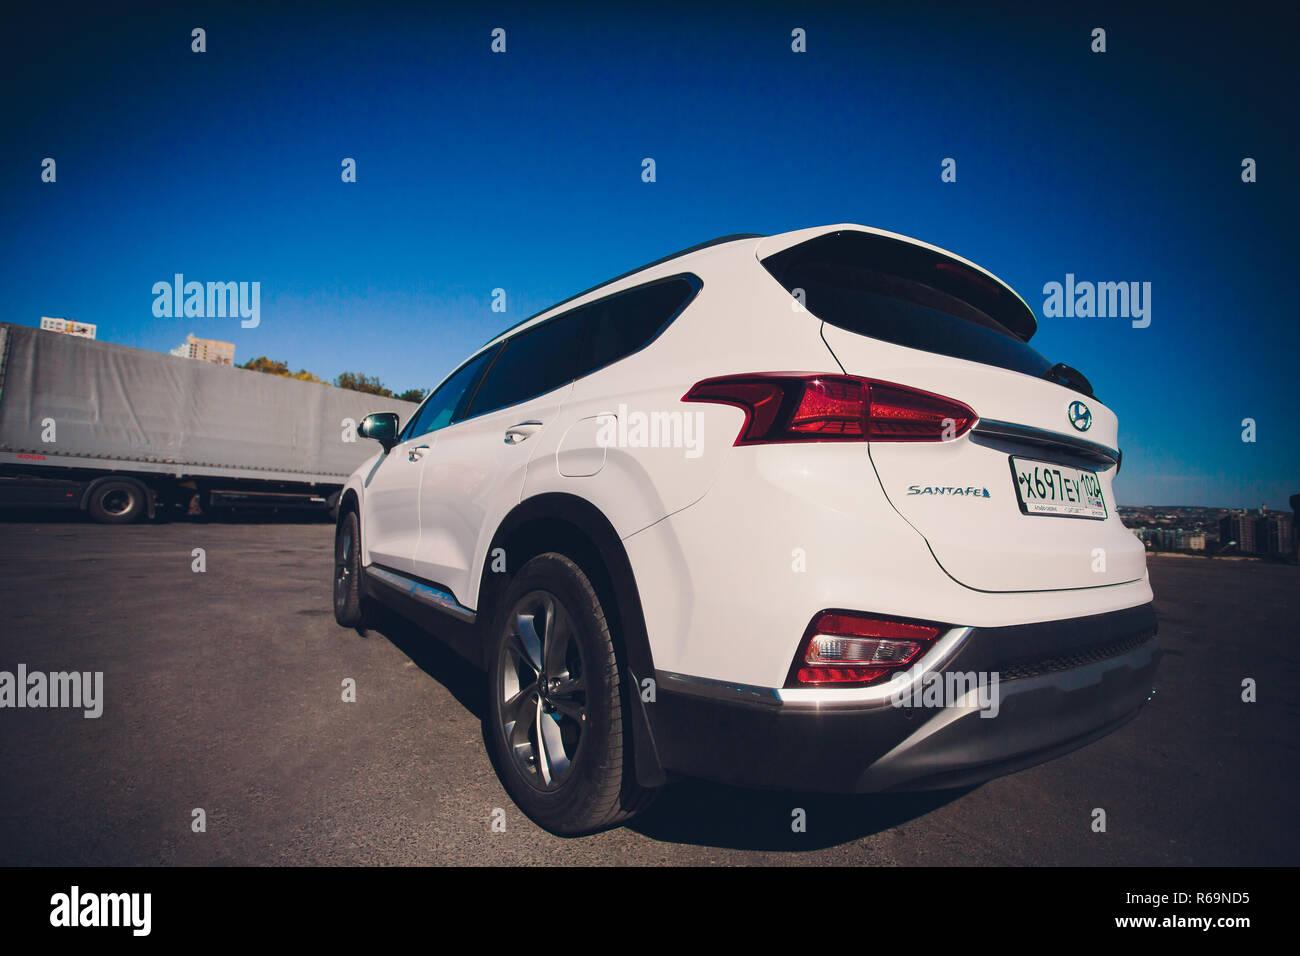 UFA, RUSSIA - 1 AUGUST 2018: Hyundai Santa Fe 2018 new suv car - Stock Image